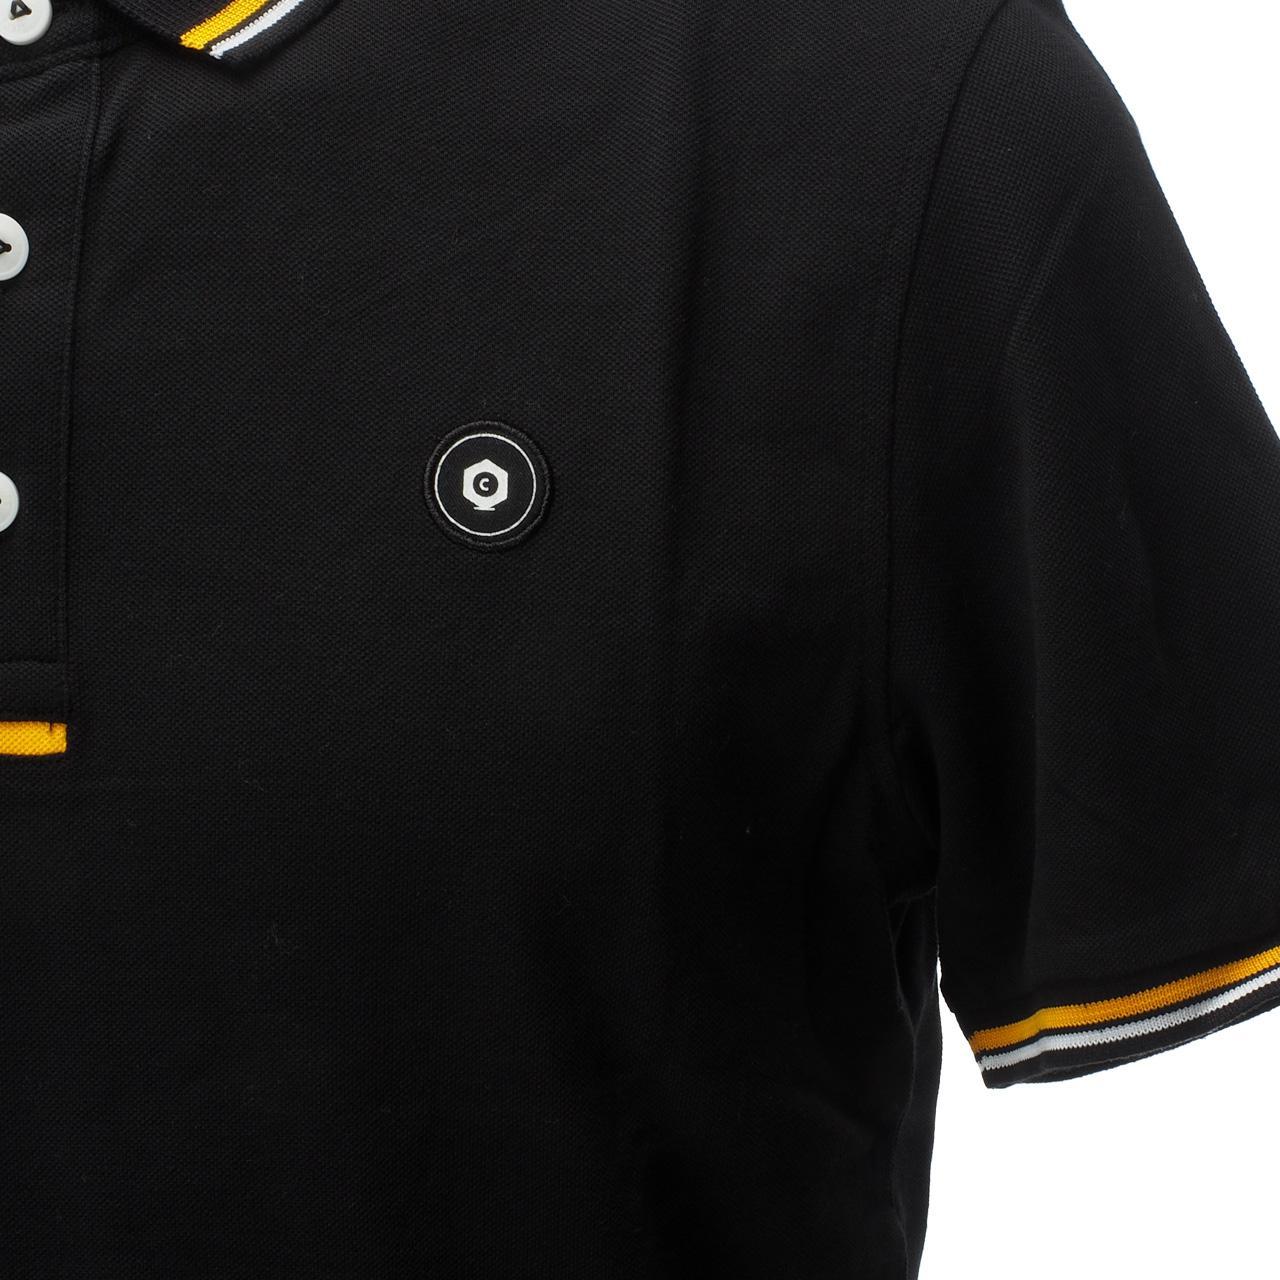 Short-Sleeve-Polo-Jack-and-Jones-Challenge-Black-Mc-Polo-Black-17260-New thumbnail 4